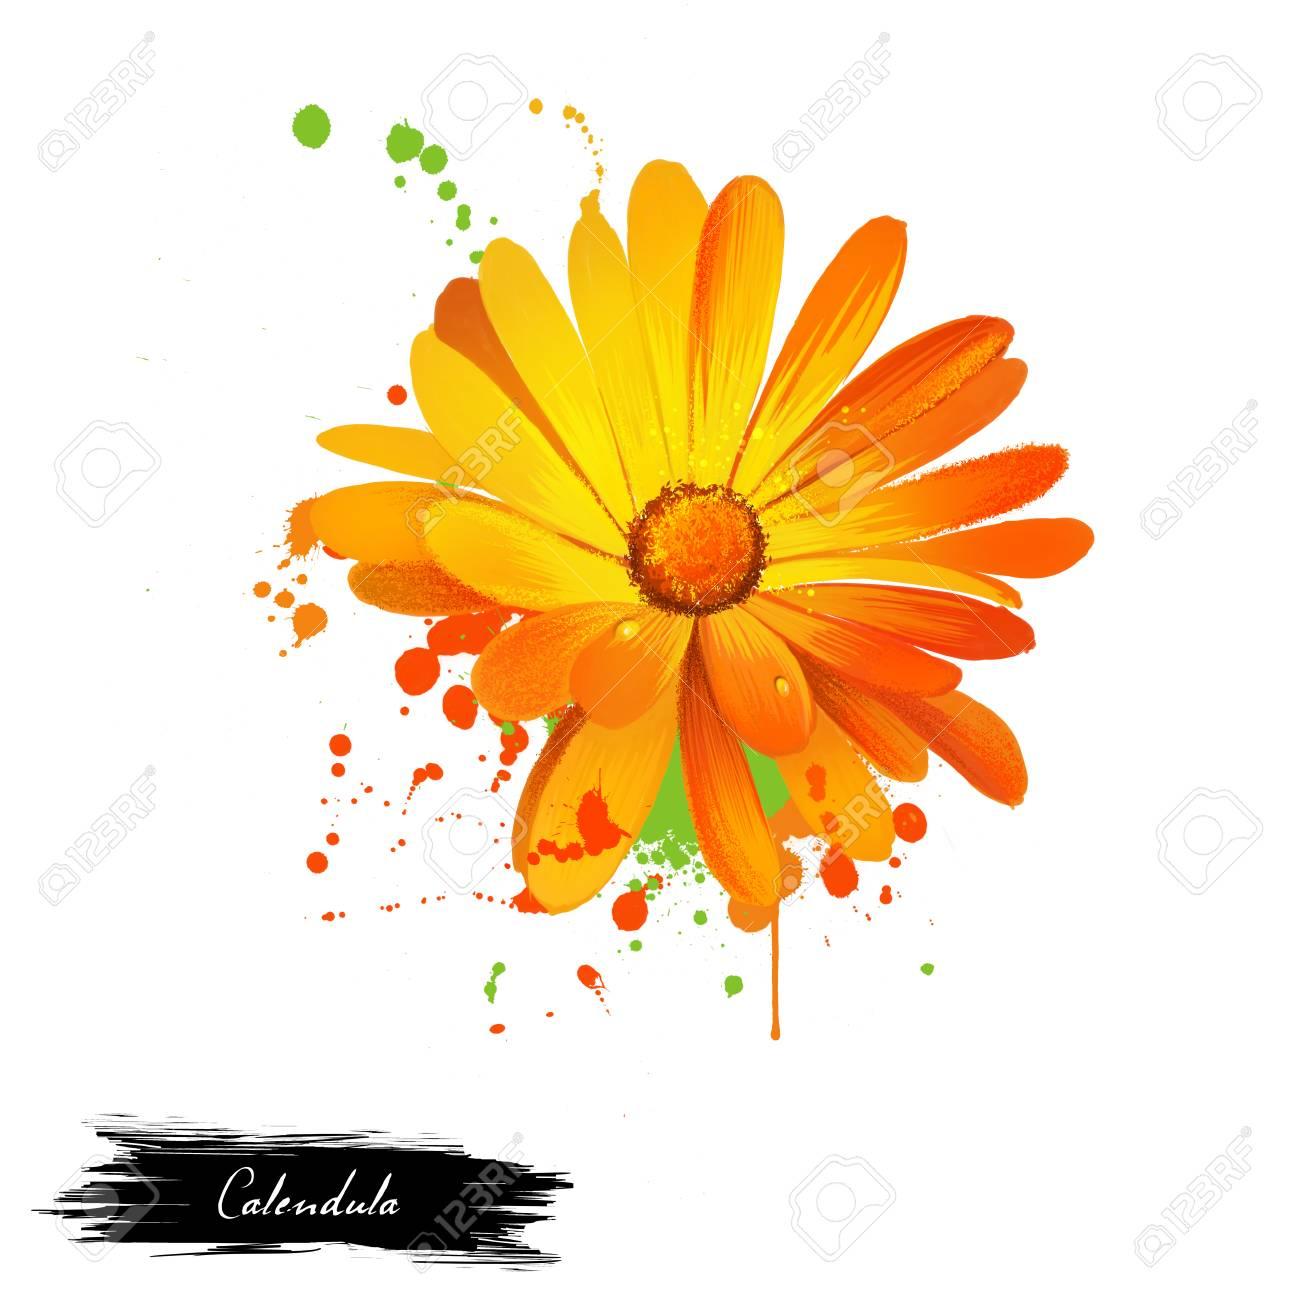 calendula illustration daisy family asteraceae marigolds genus